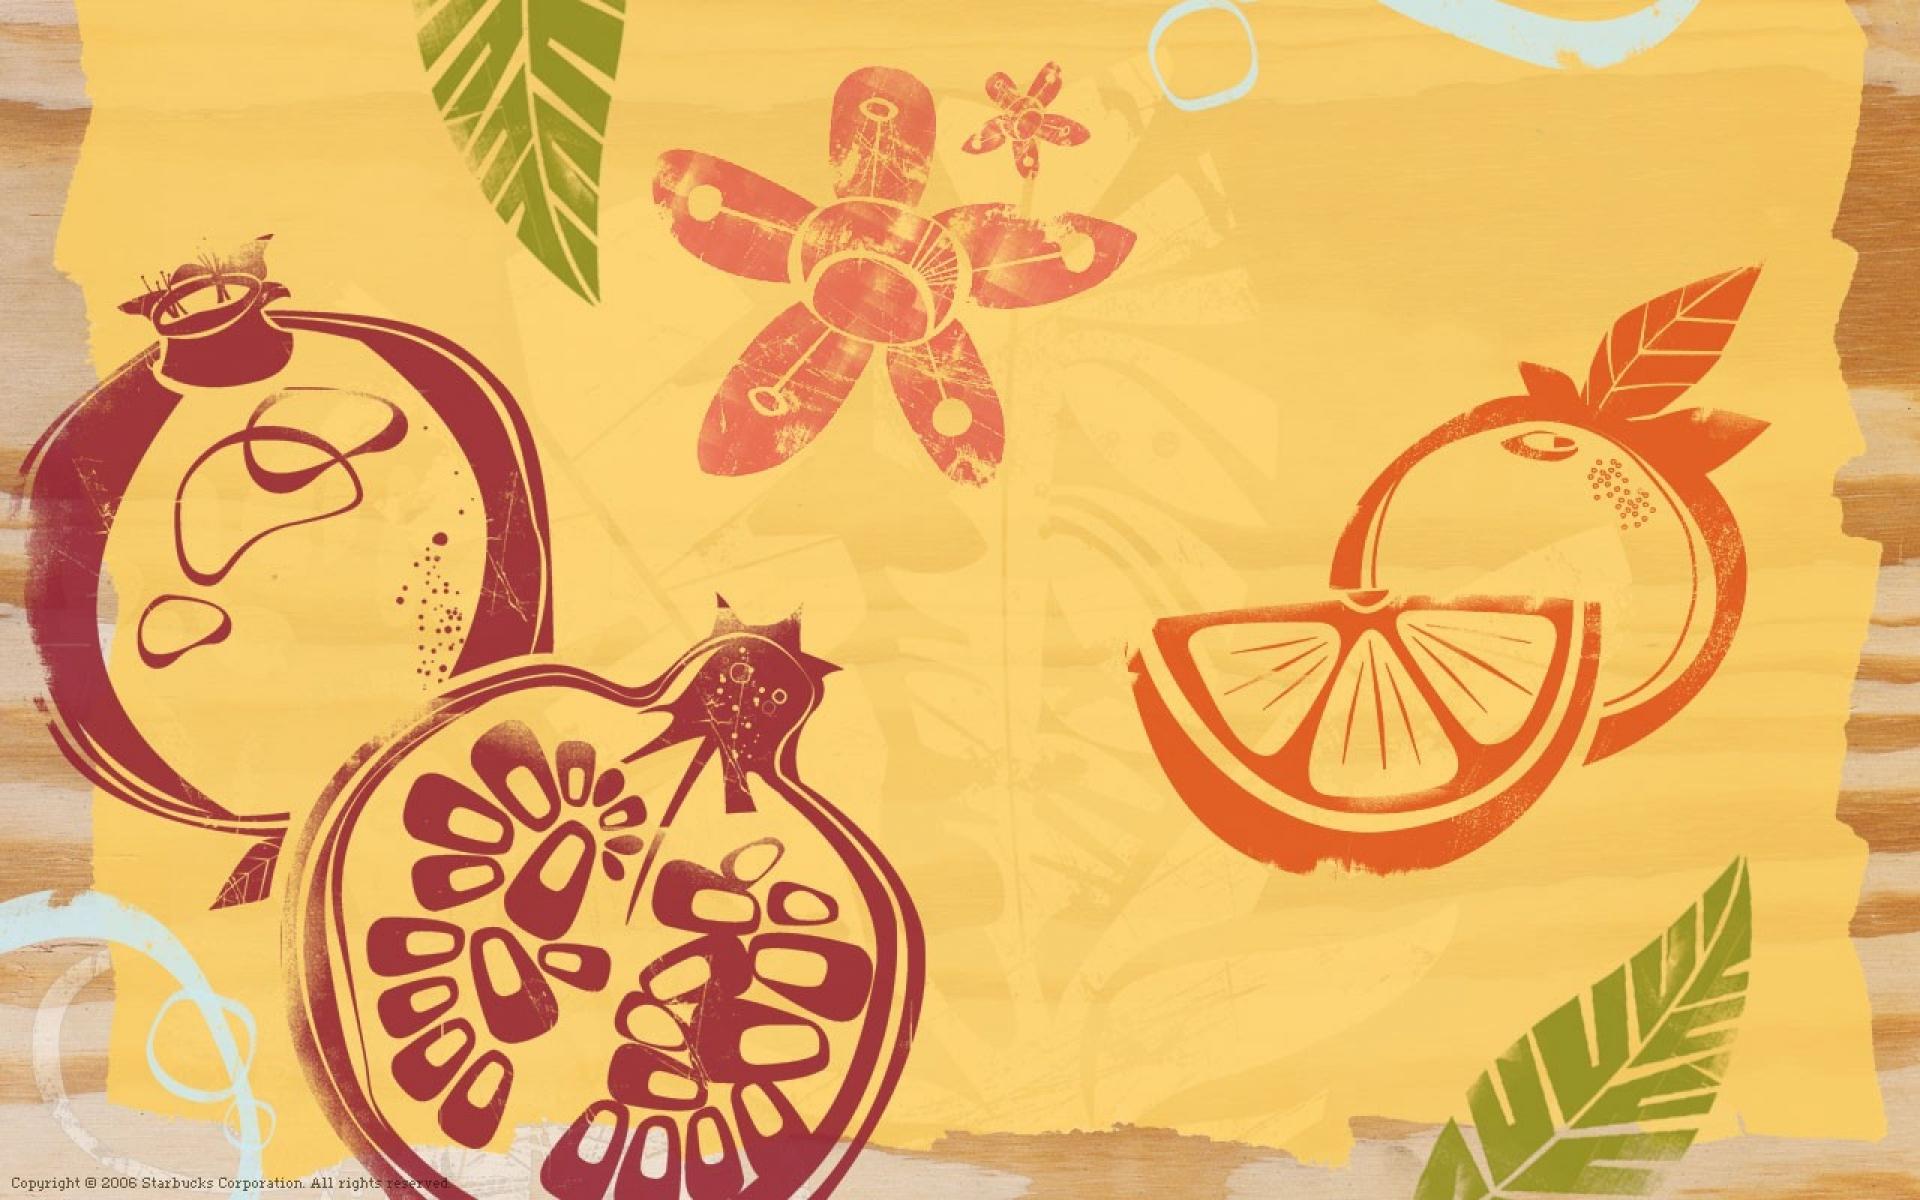 Картинки Текстура, фон, фрукты, бумага фото и обои на рабочий стол